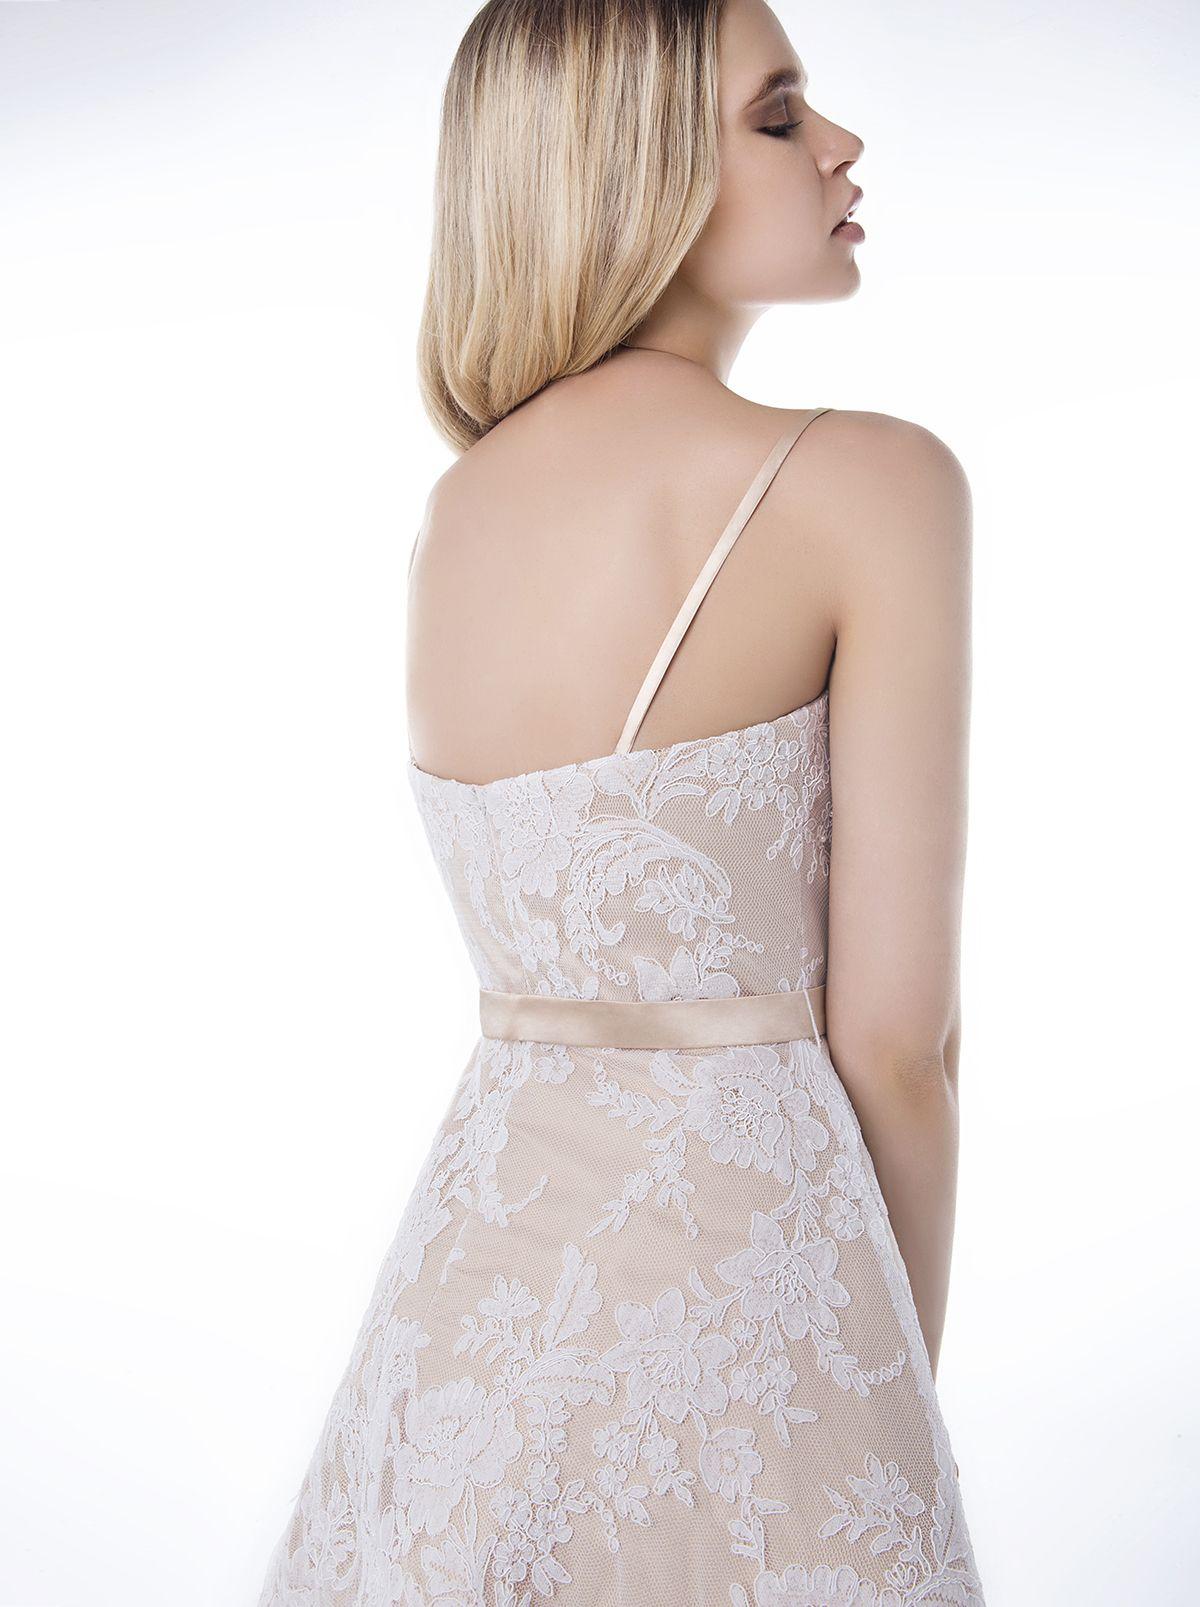 9cc478b65606 ... πίνακα Cocktail Dresses 2016 του χρήστη Mikael Evening Dresses.  Ετικέτες. Κοκτέιλ Φορέματα · Κοκτέιλ Φορέματα